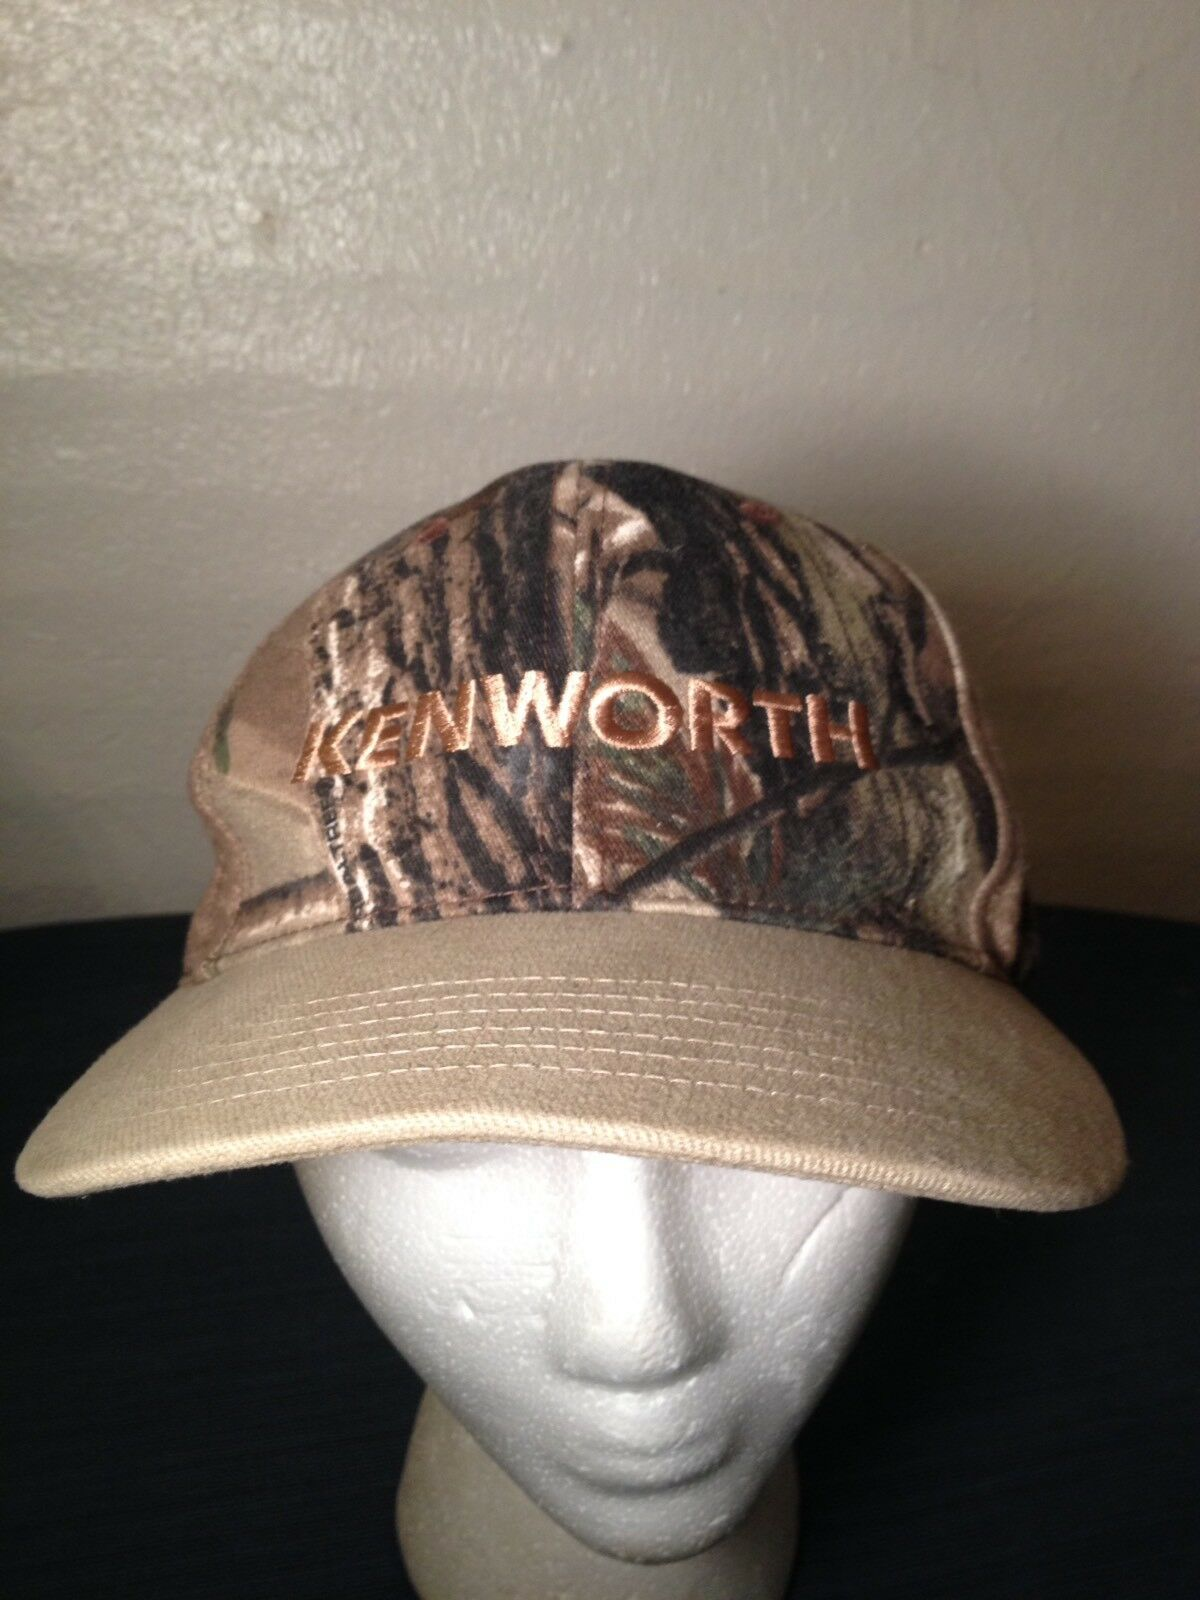 Kenworth Trucking Snapback Ball Trucker Hat Cap Camo Camoflage Hunting Trucker Ball Farmer 877444